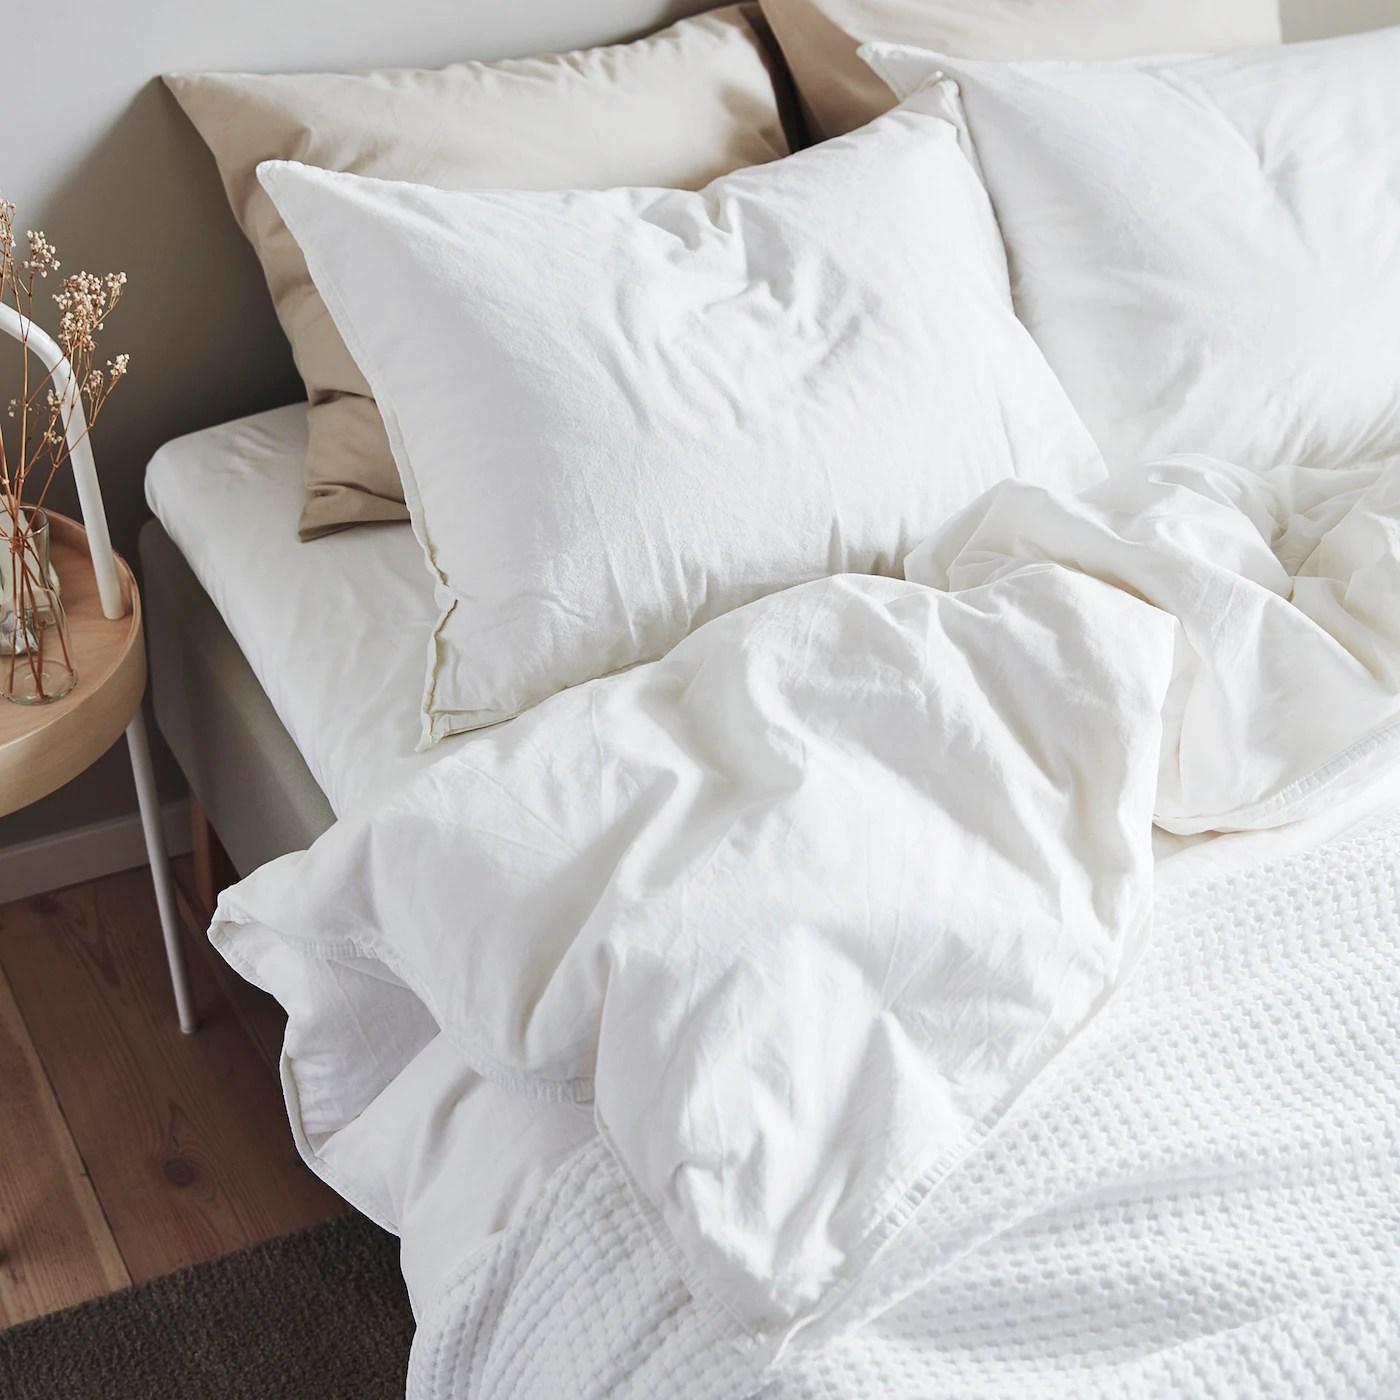 Angslilja Housse Couette 2 Taies Blanc 240x220 65x65 Cm Ikea